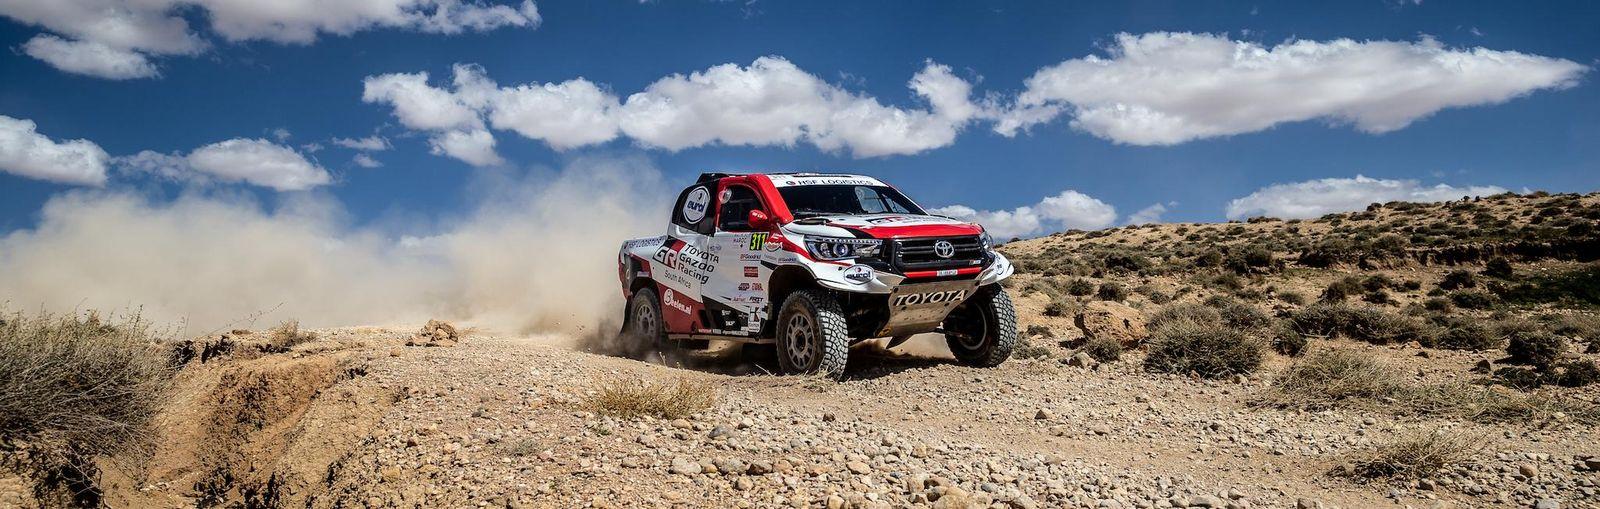 Rally: Dakar